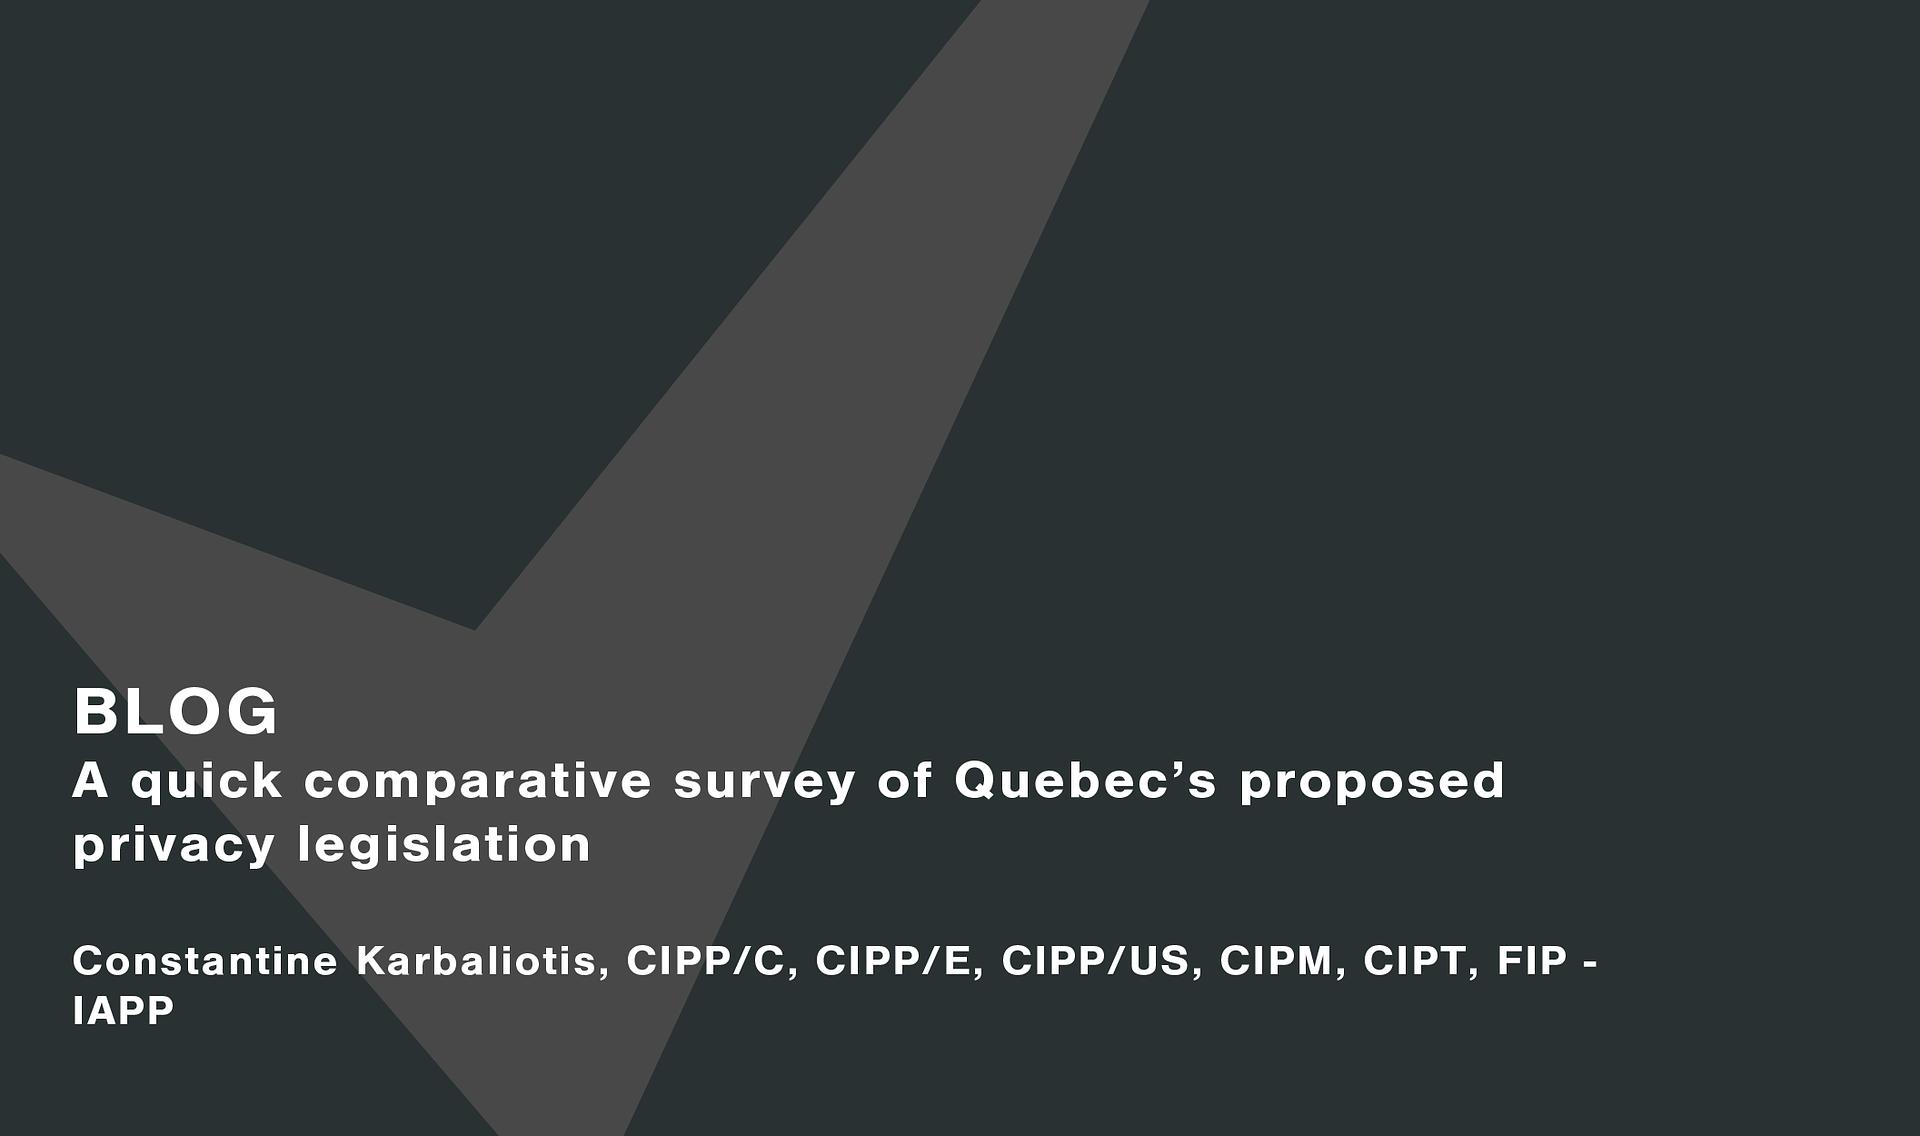 A quick comparative survey of Quebec's proposed privacy legislation Cassie personal information & consent management